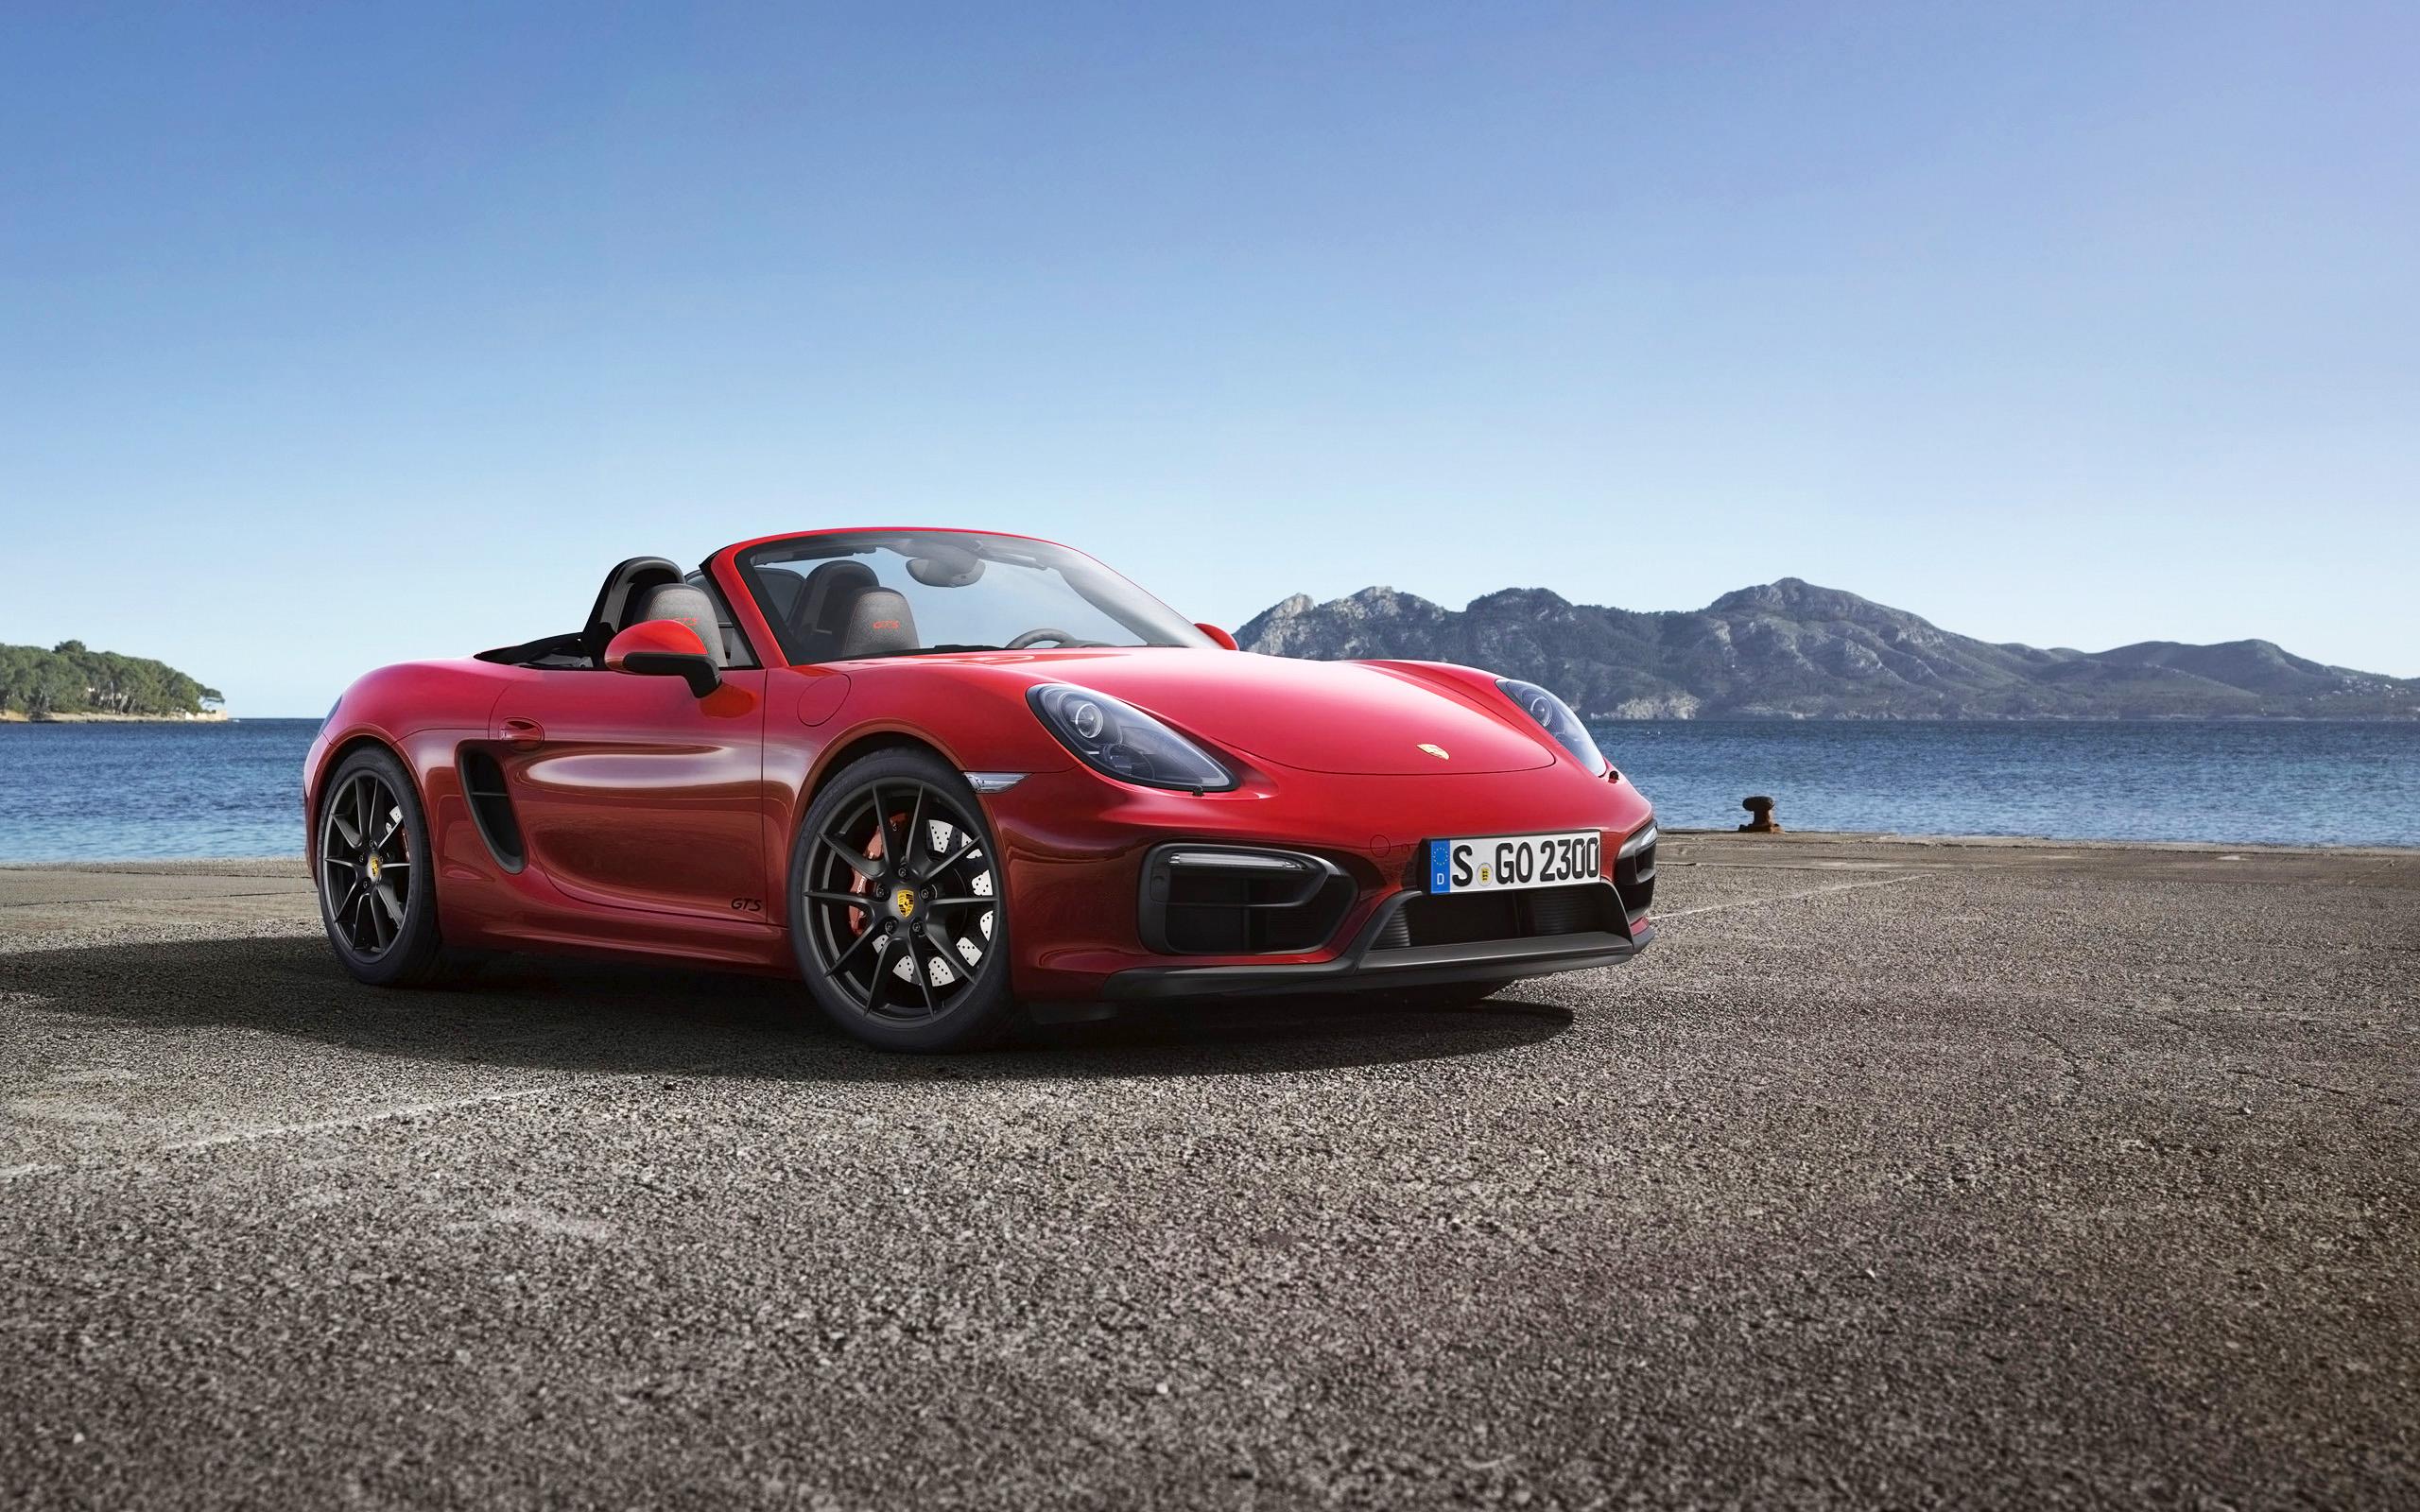 Porsche Boxster HD Wallpaper | Background Image | 2560x1600 | ID:616509 - Wallpaper Abyss